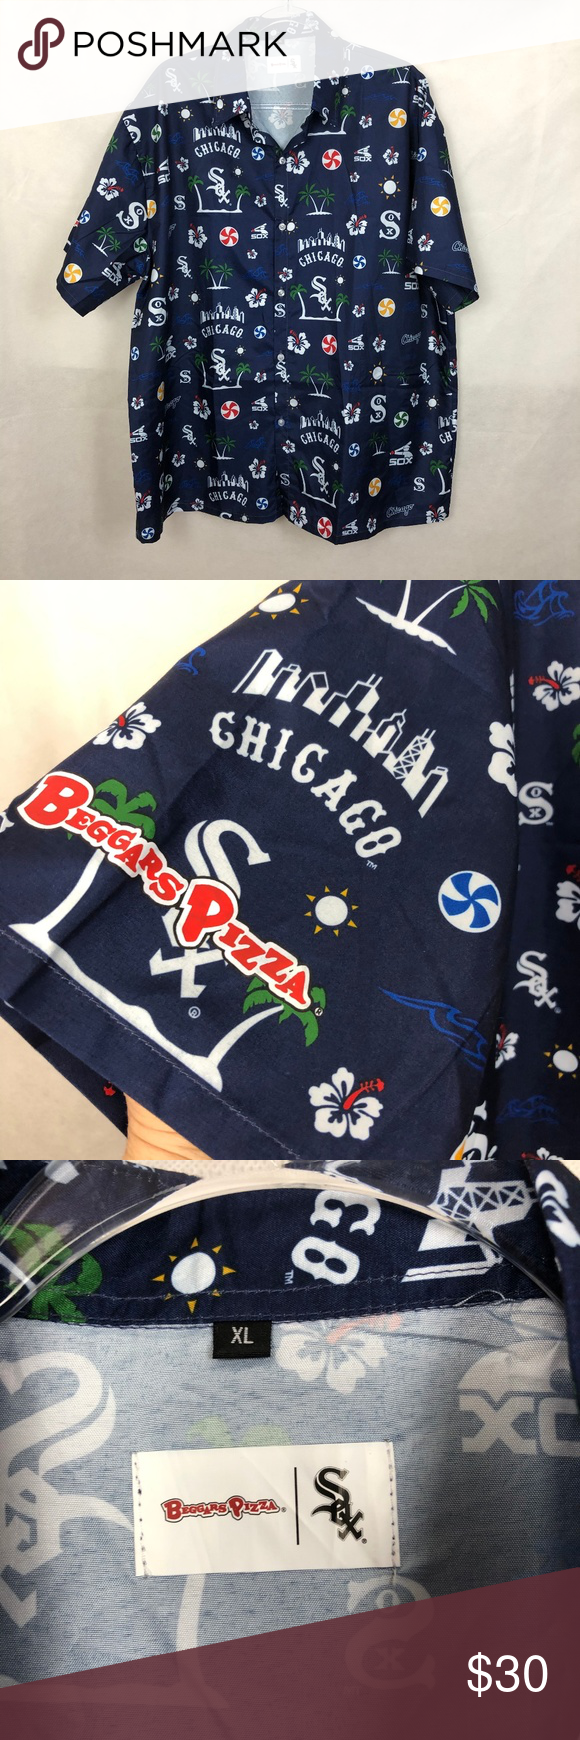 83f972c3 Beggars Pizza White Sox Hawaiian Shirt XL -Beggar's Pizza Chicago White Sox  hawaiian button down